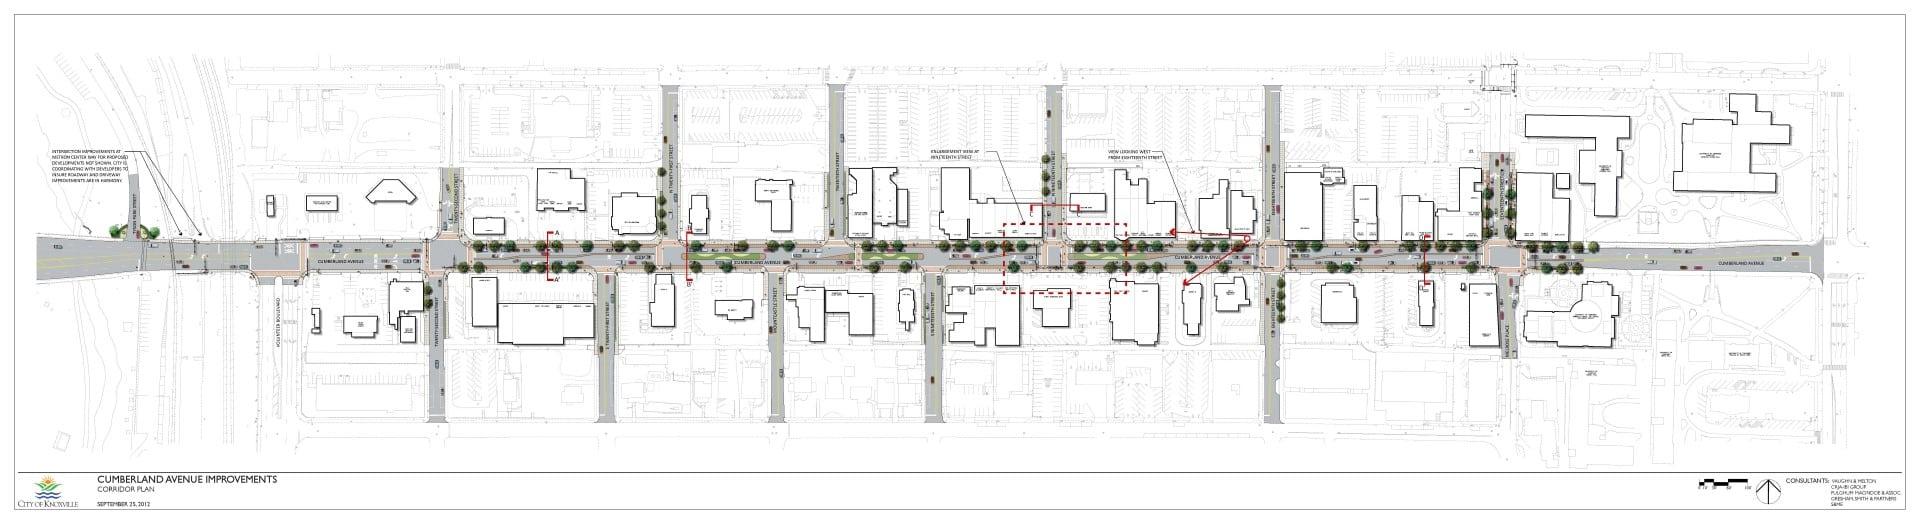 Rendering of the Cumberland Avenue Corridor Plan